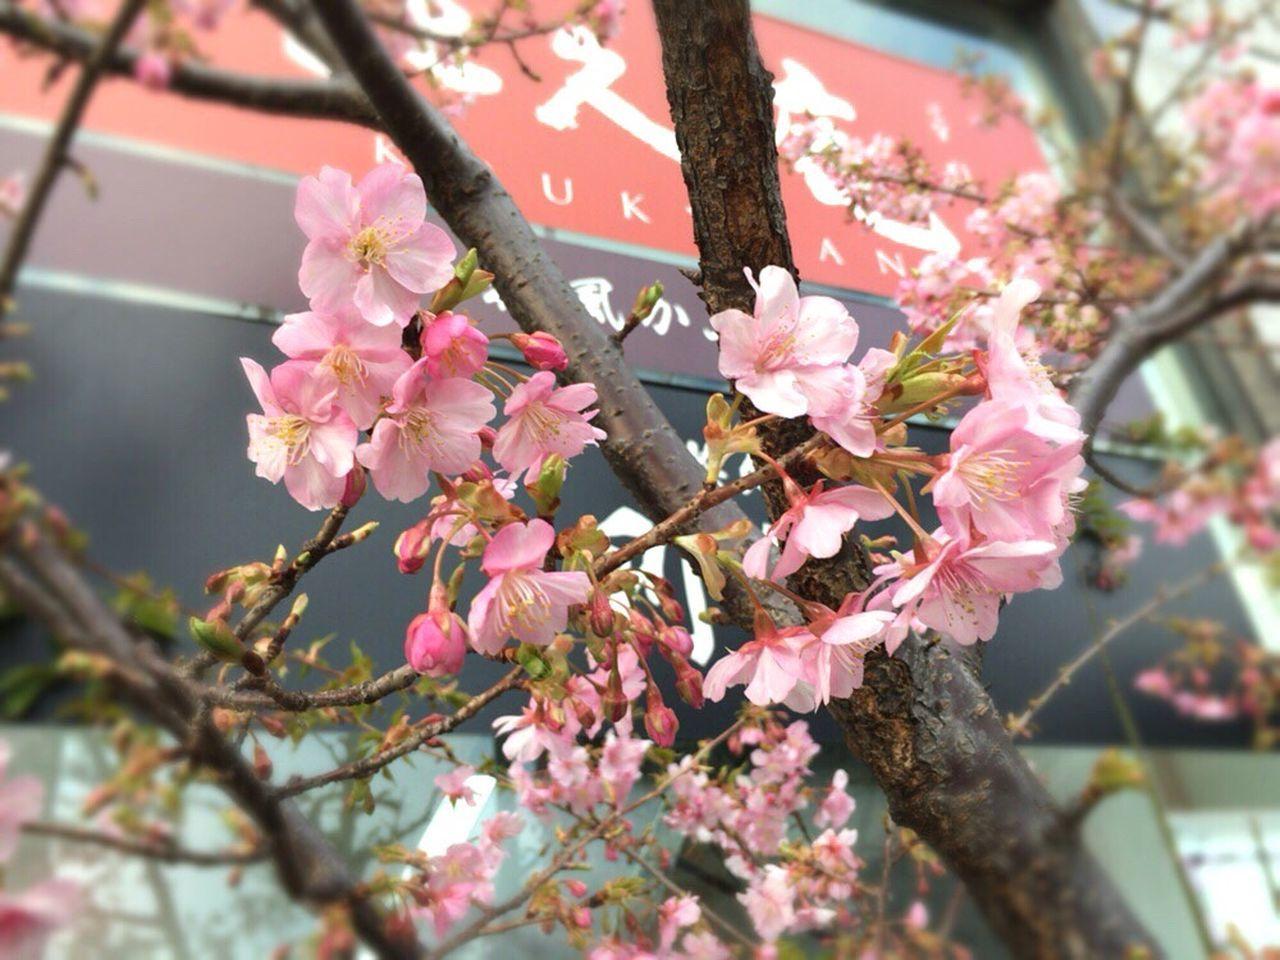 Pink Color Kyoto, Japan Kyoto Spling Flower Sakura 2017 Kyoto Cherry Blossom Cherry Blossom Cherry Blossoms Kyoto,japan Kyoto Spling Kyoto Sakura Kyoto Sakura 2017 February Cherry Blossoms February Sakura Kyoto City